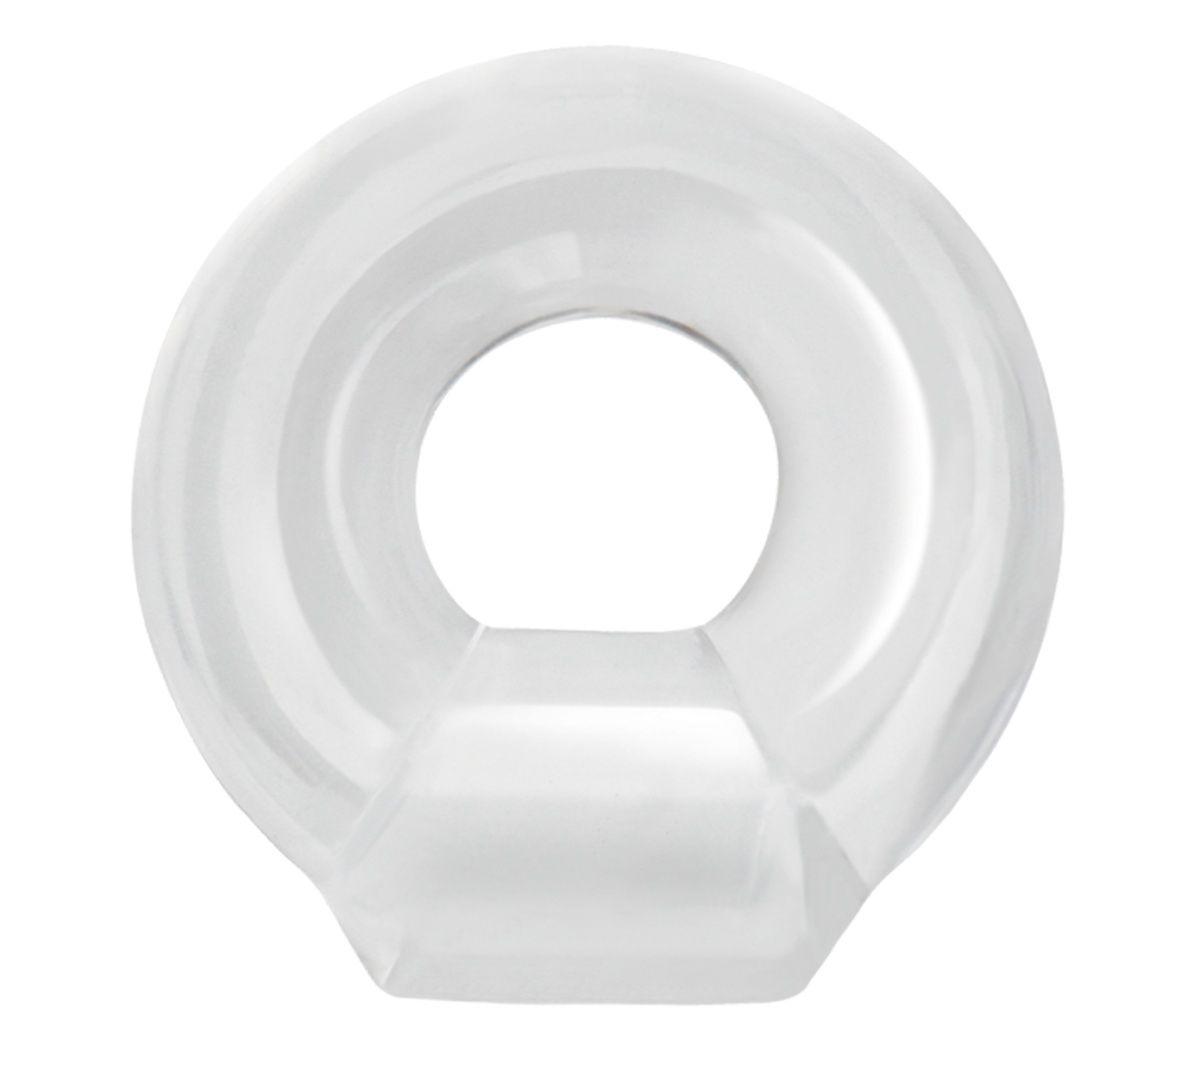 Прозрачное эрекционное кольцо Drop Ring